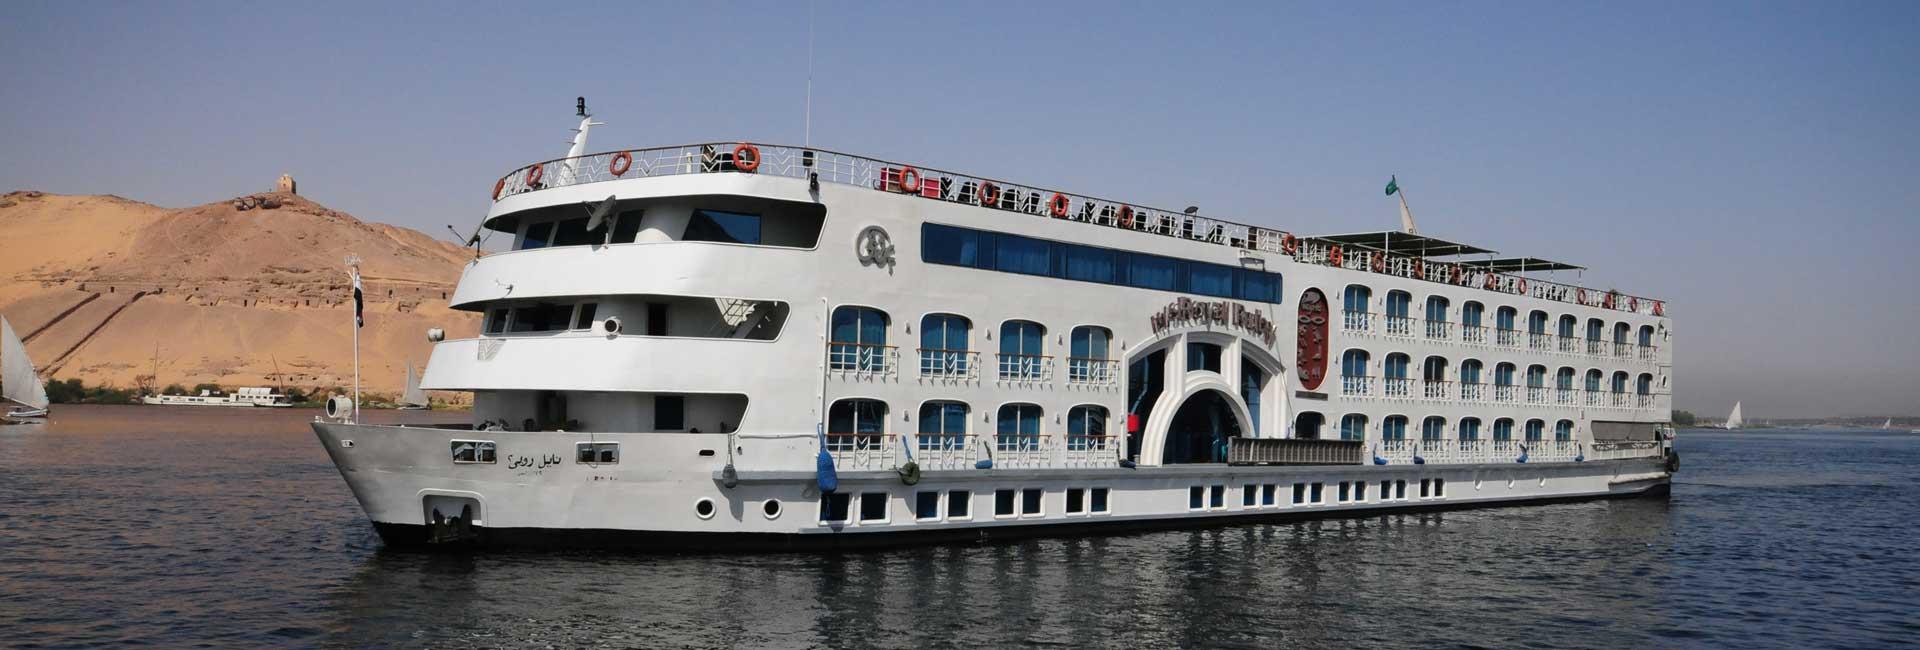 Hurghada Cruises And Water Tours